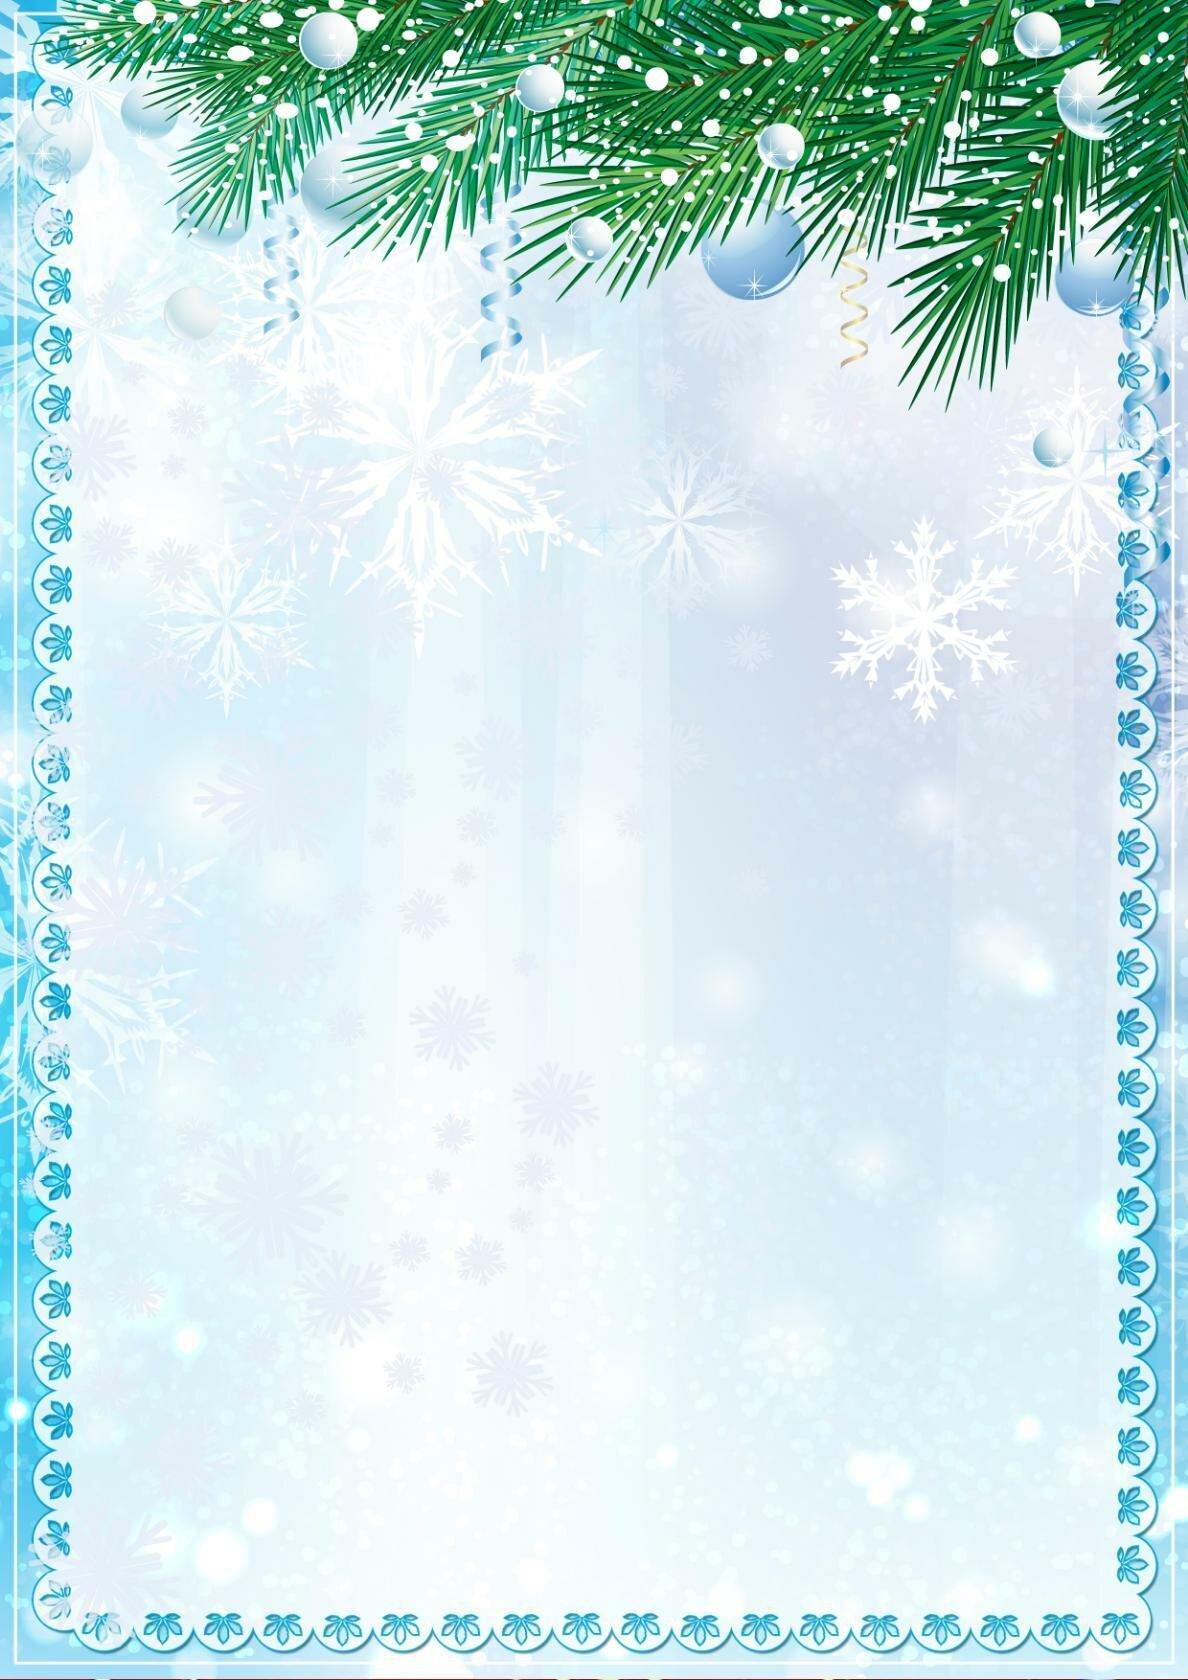 живут фон для объявлений новогодний смело сказать